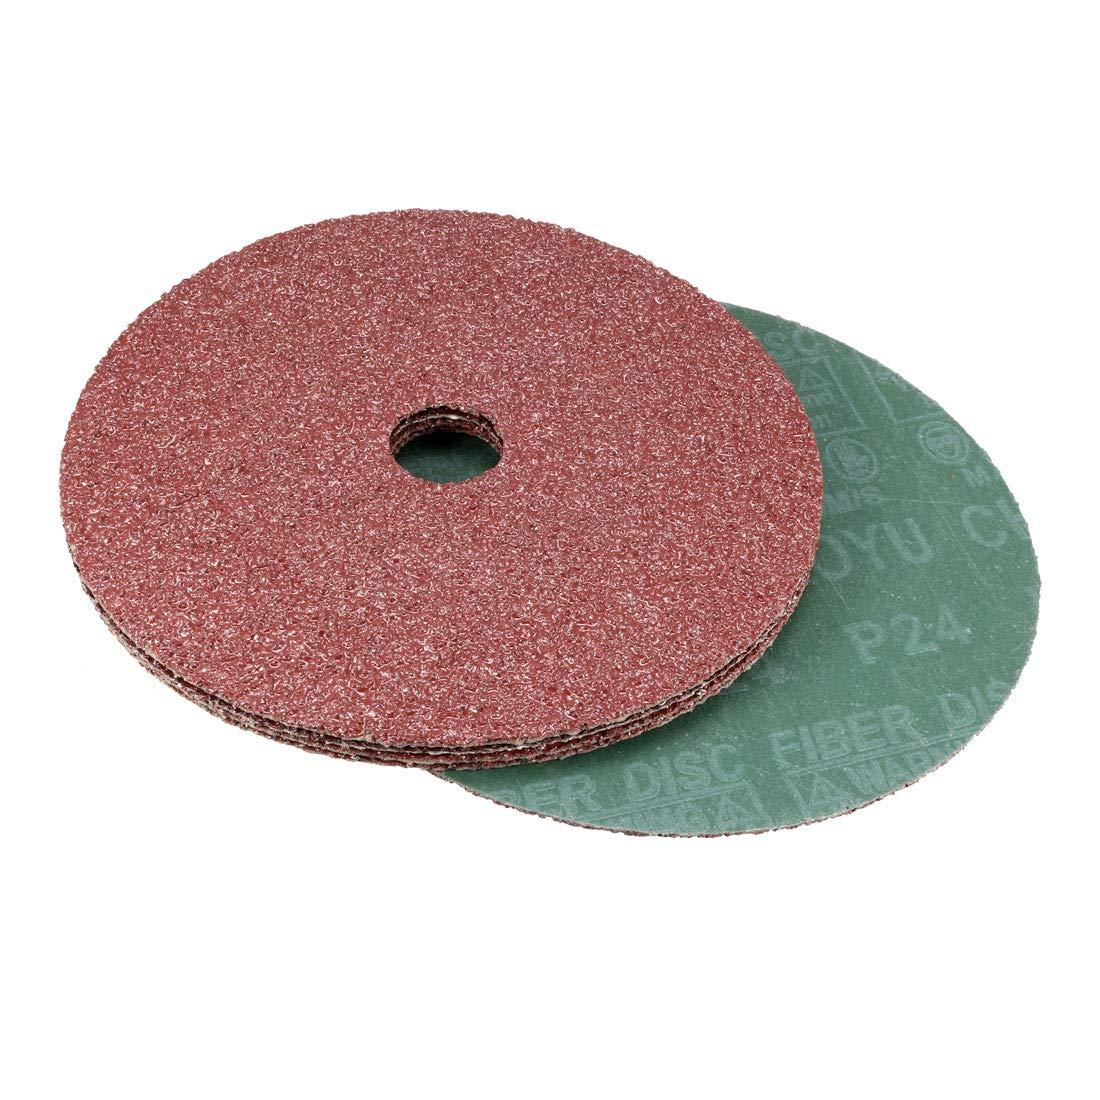 5 Pack uxcell 7-Inch x 7//8-Inch Aluminum Oxide Resin Fiber Discs Center Hole 120 Grit Sanding Grinding Discs